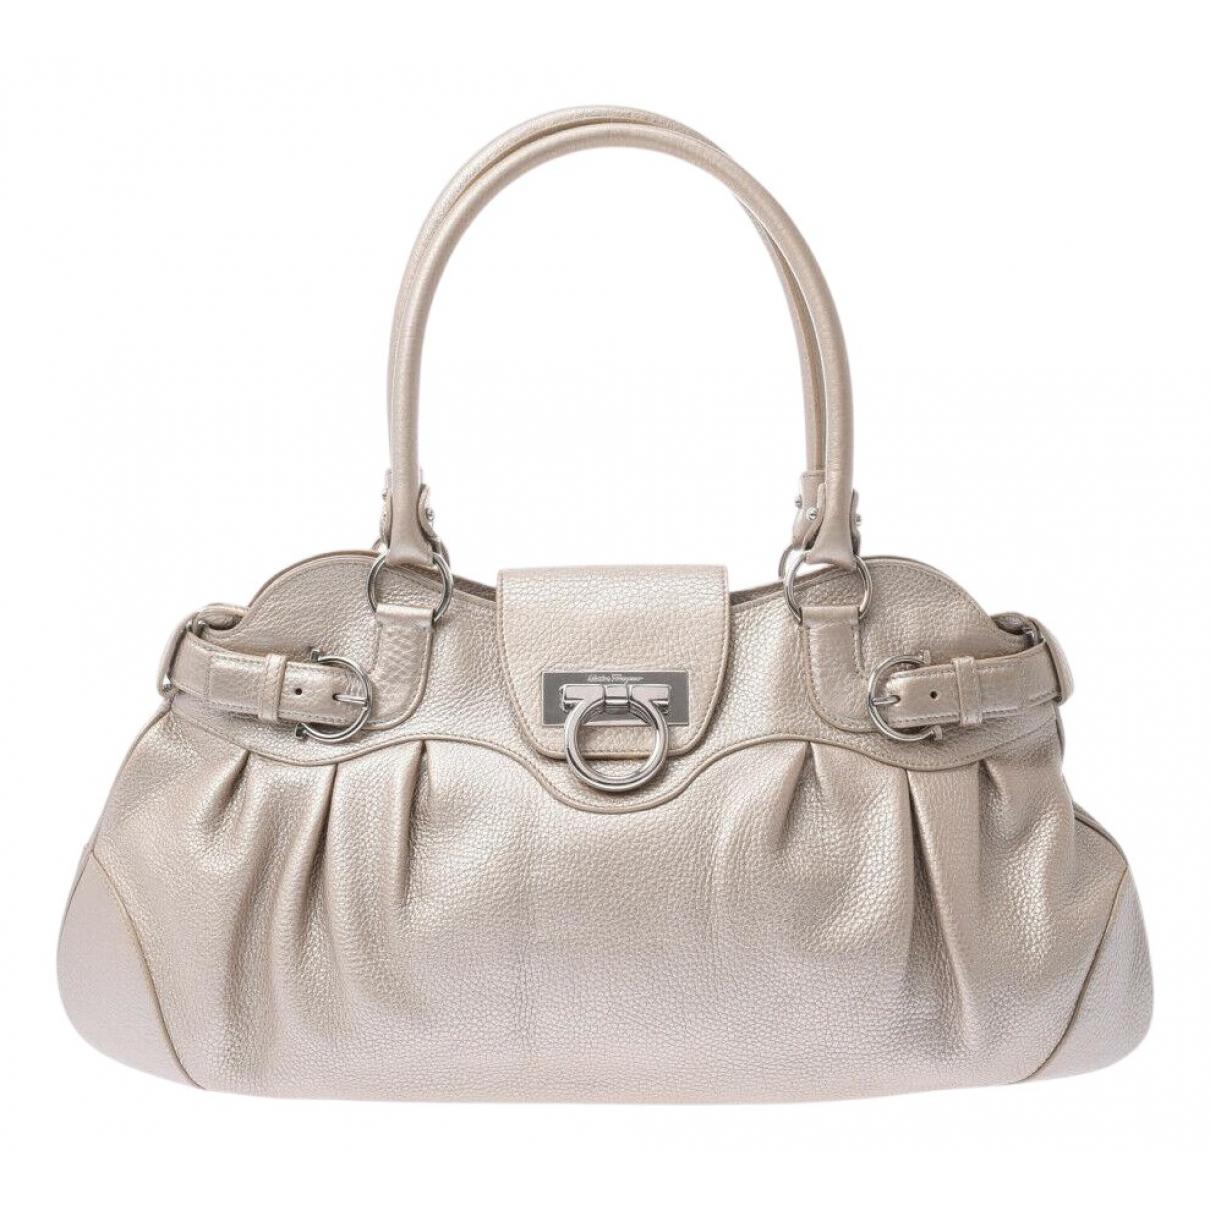 Salvatore Ferragamo N Silver Leather handbag for Women N